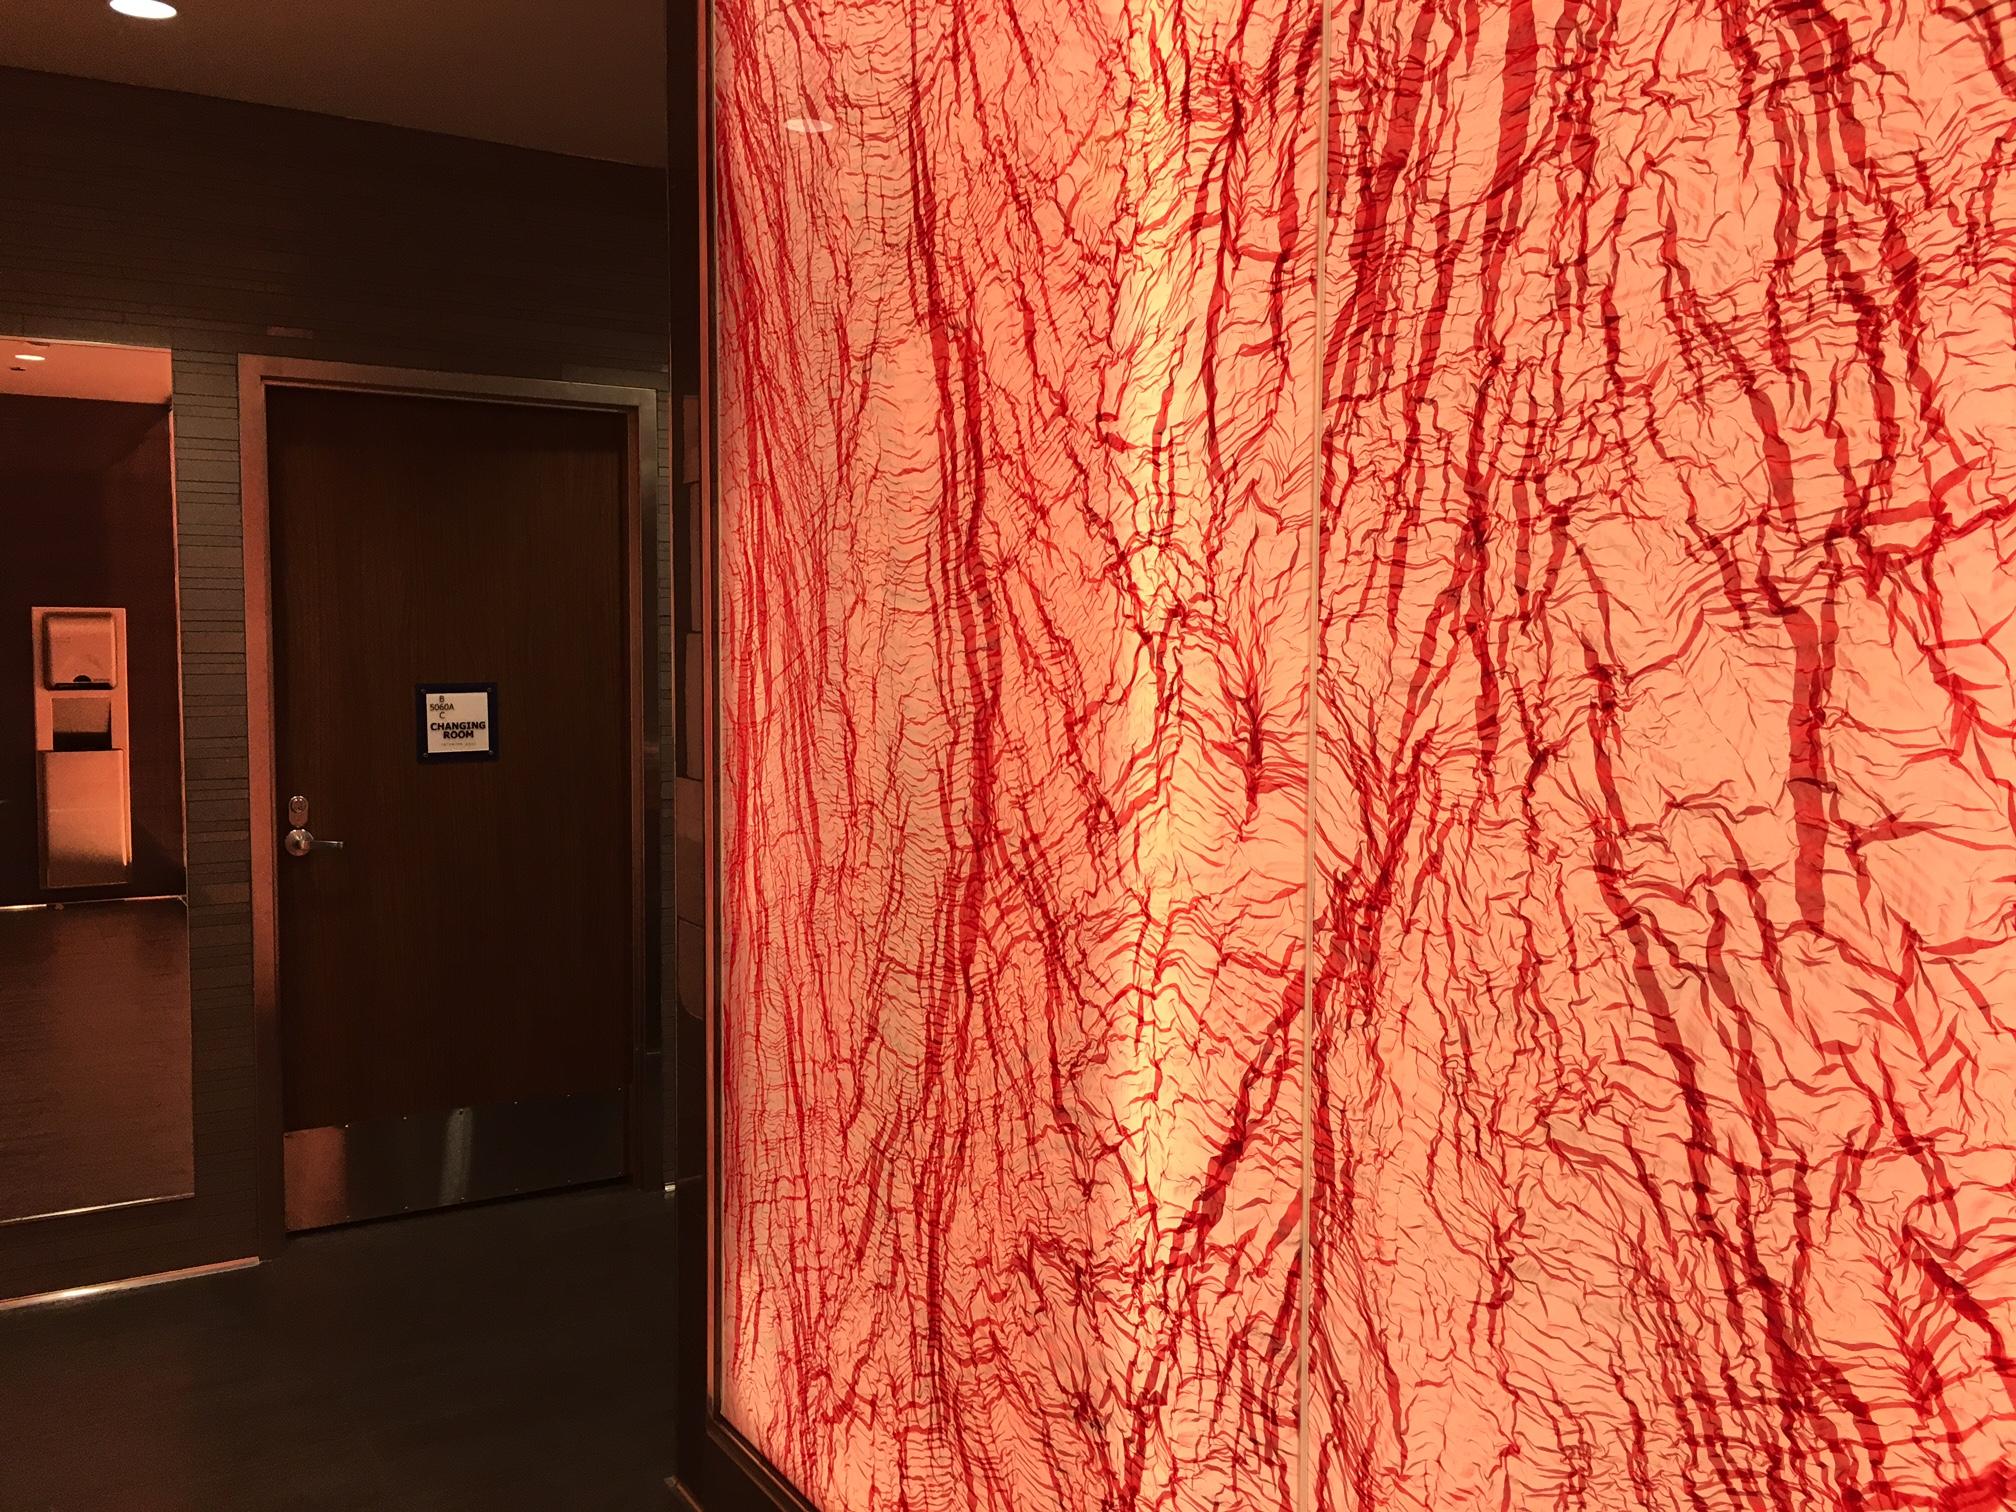 Wall Near Bathroom, Delta Sky Club Seattle Review